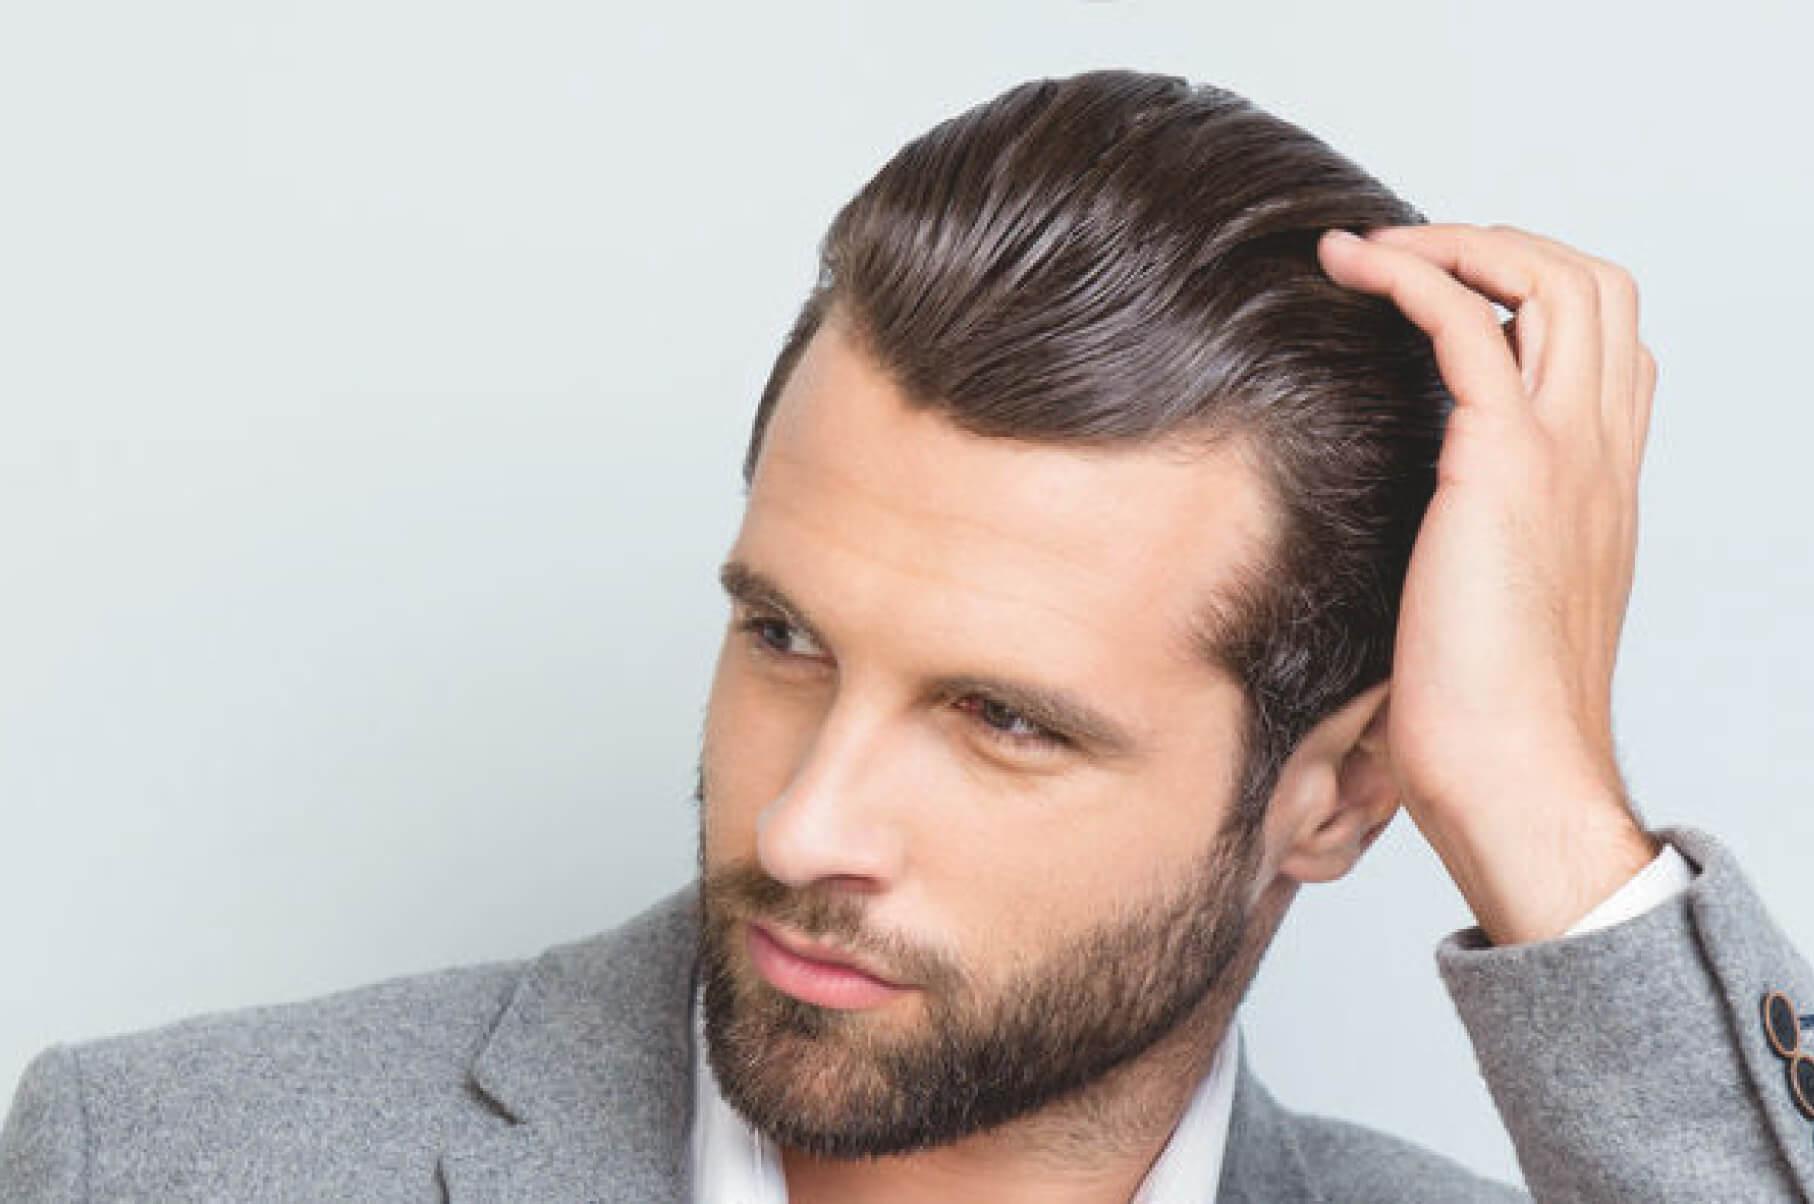 Laser Hair Regrowth in Manchester